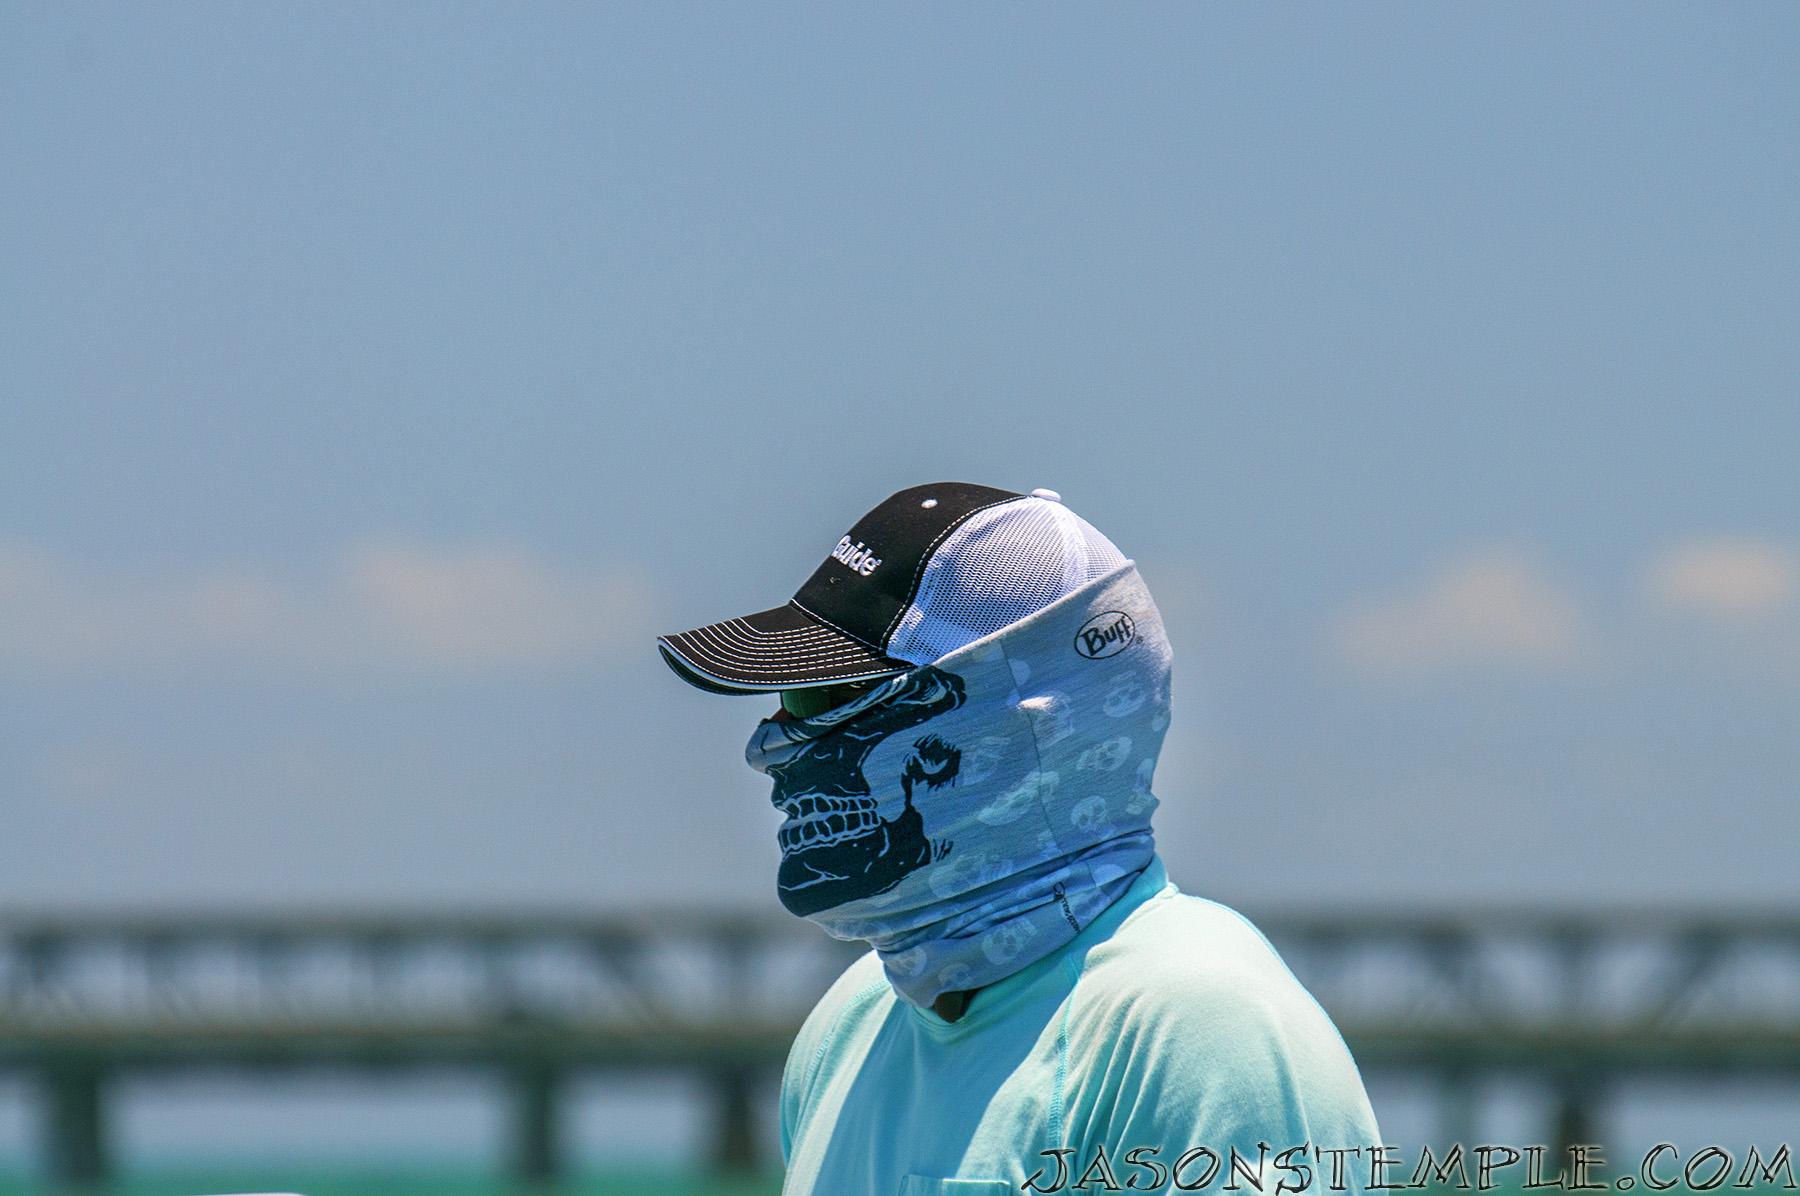 The Buff revolutionized fishing sun protection